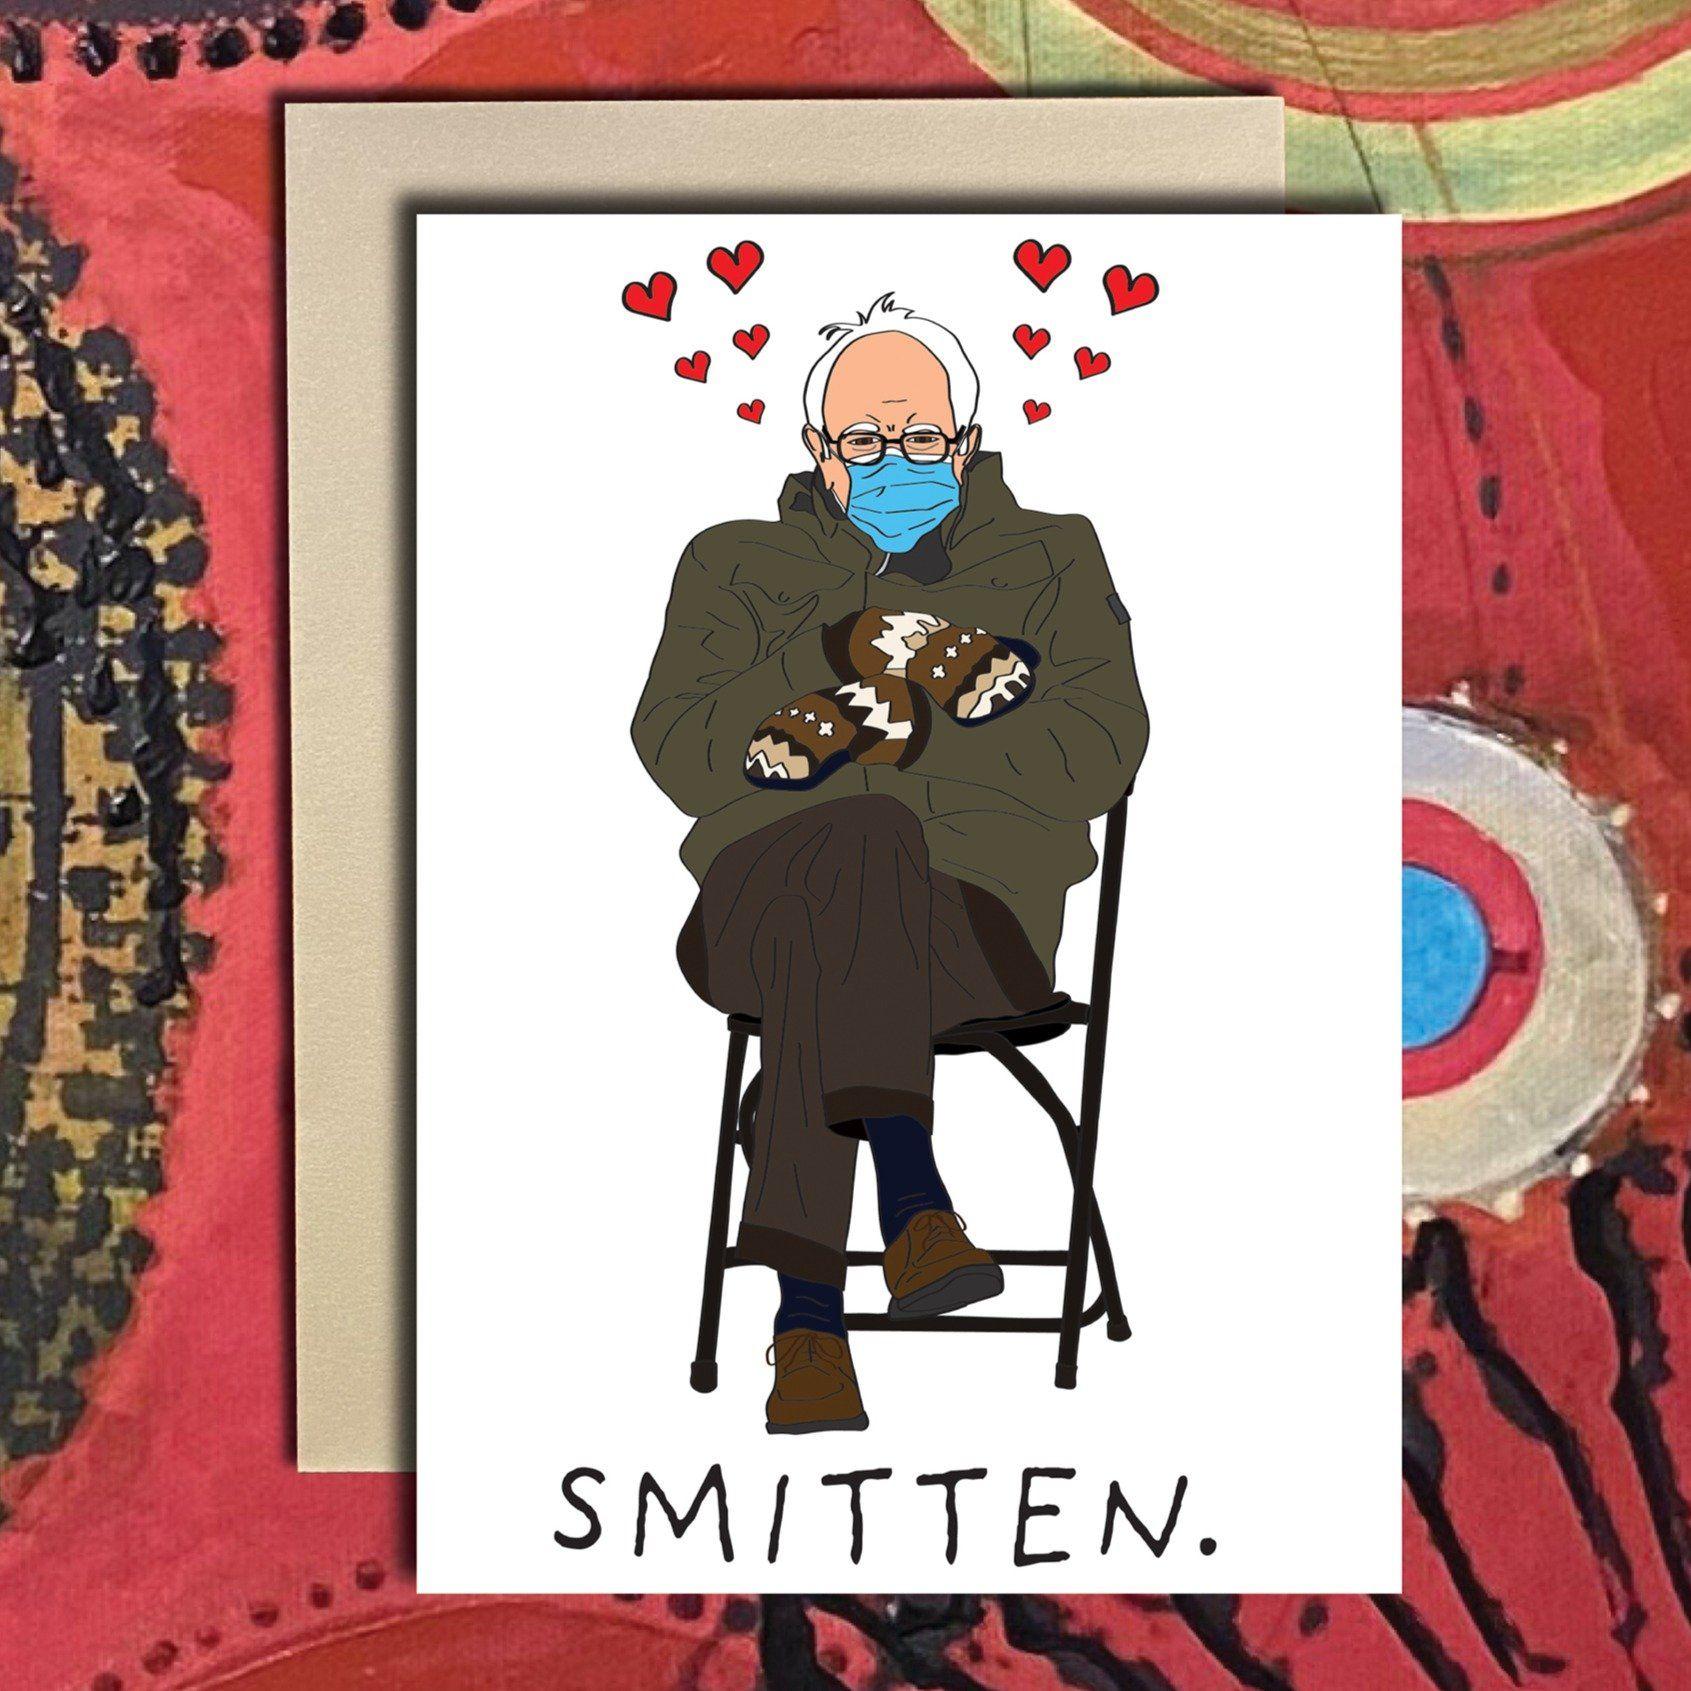 Bernie Sanders Inauguration Mittens Valentine S Day Card In 2021 Funniest Valentines Cards Valentines Cards Valentines Memes